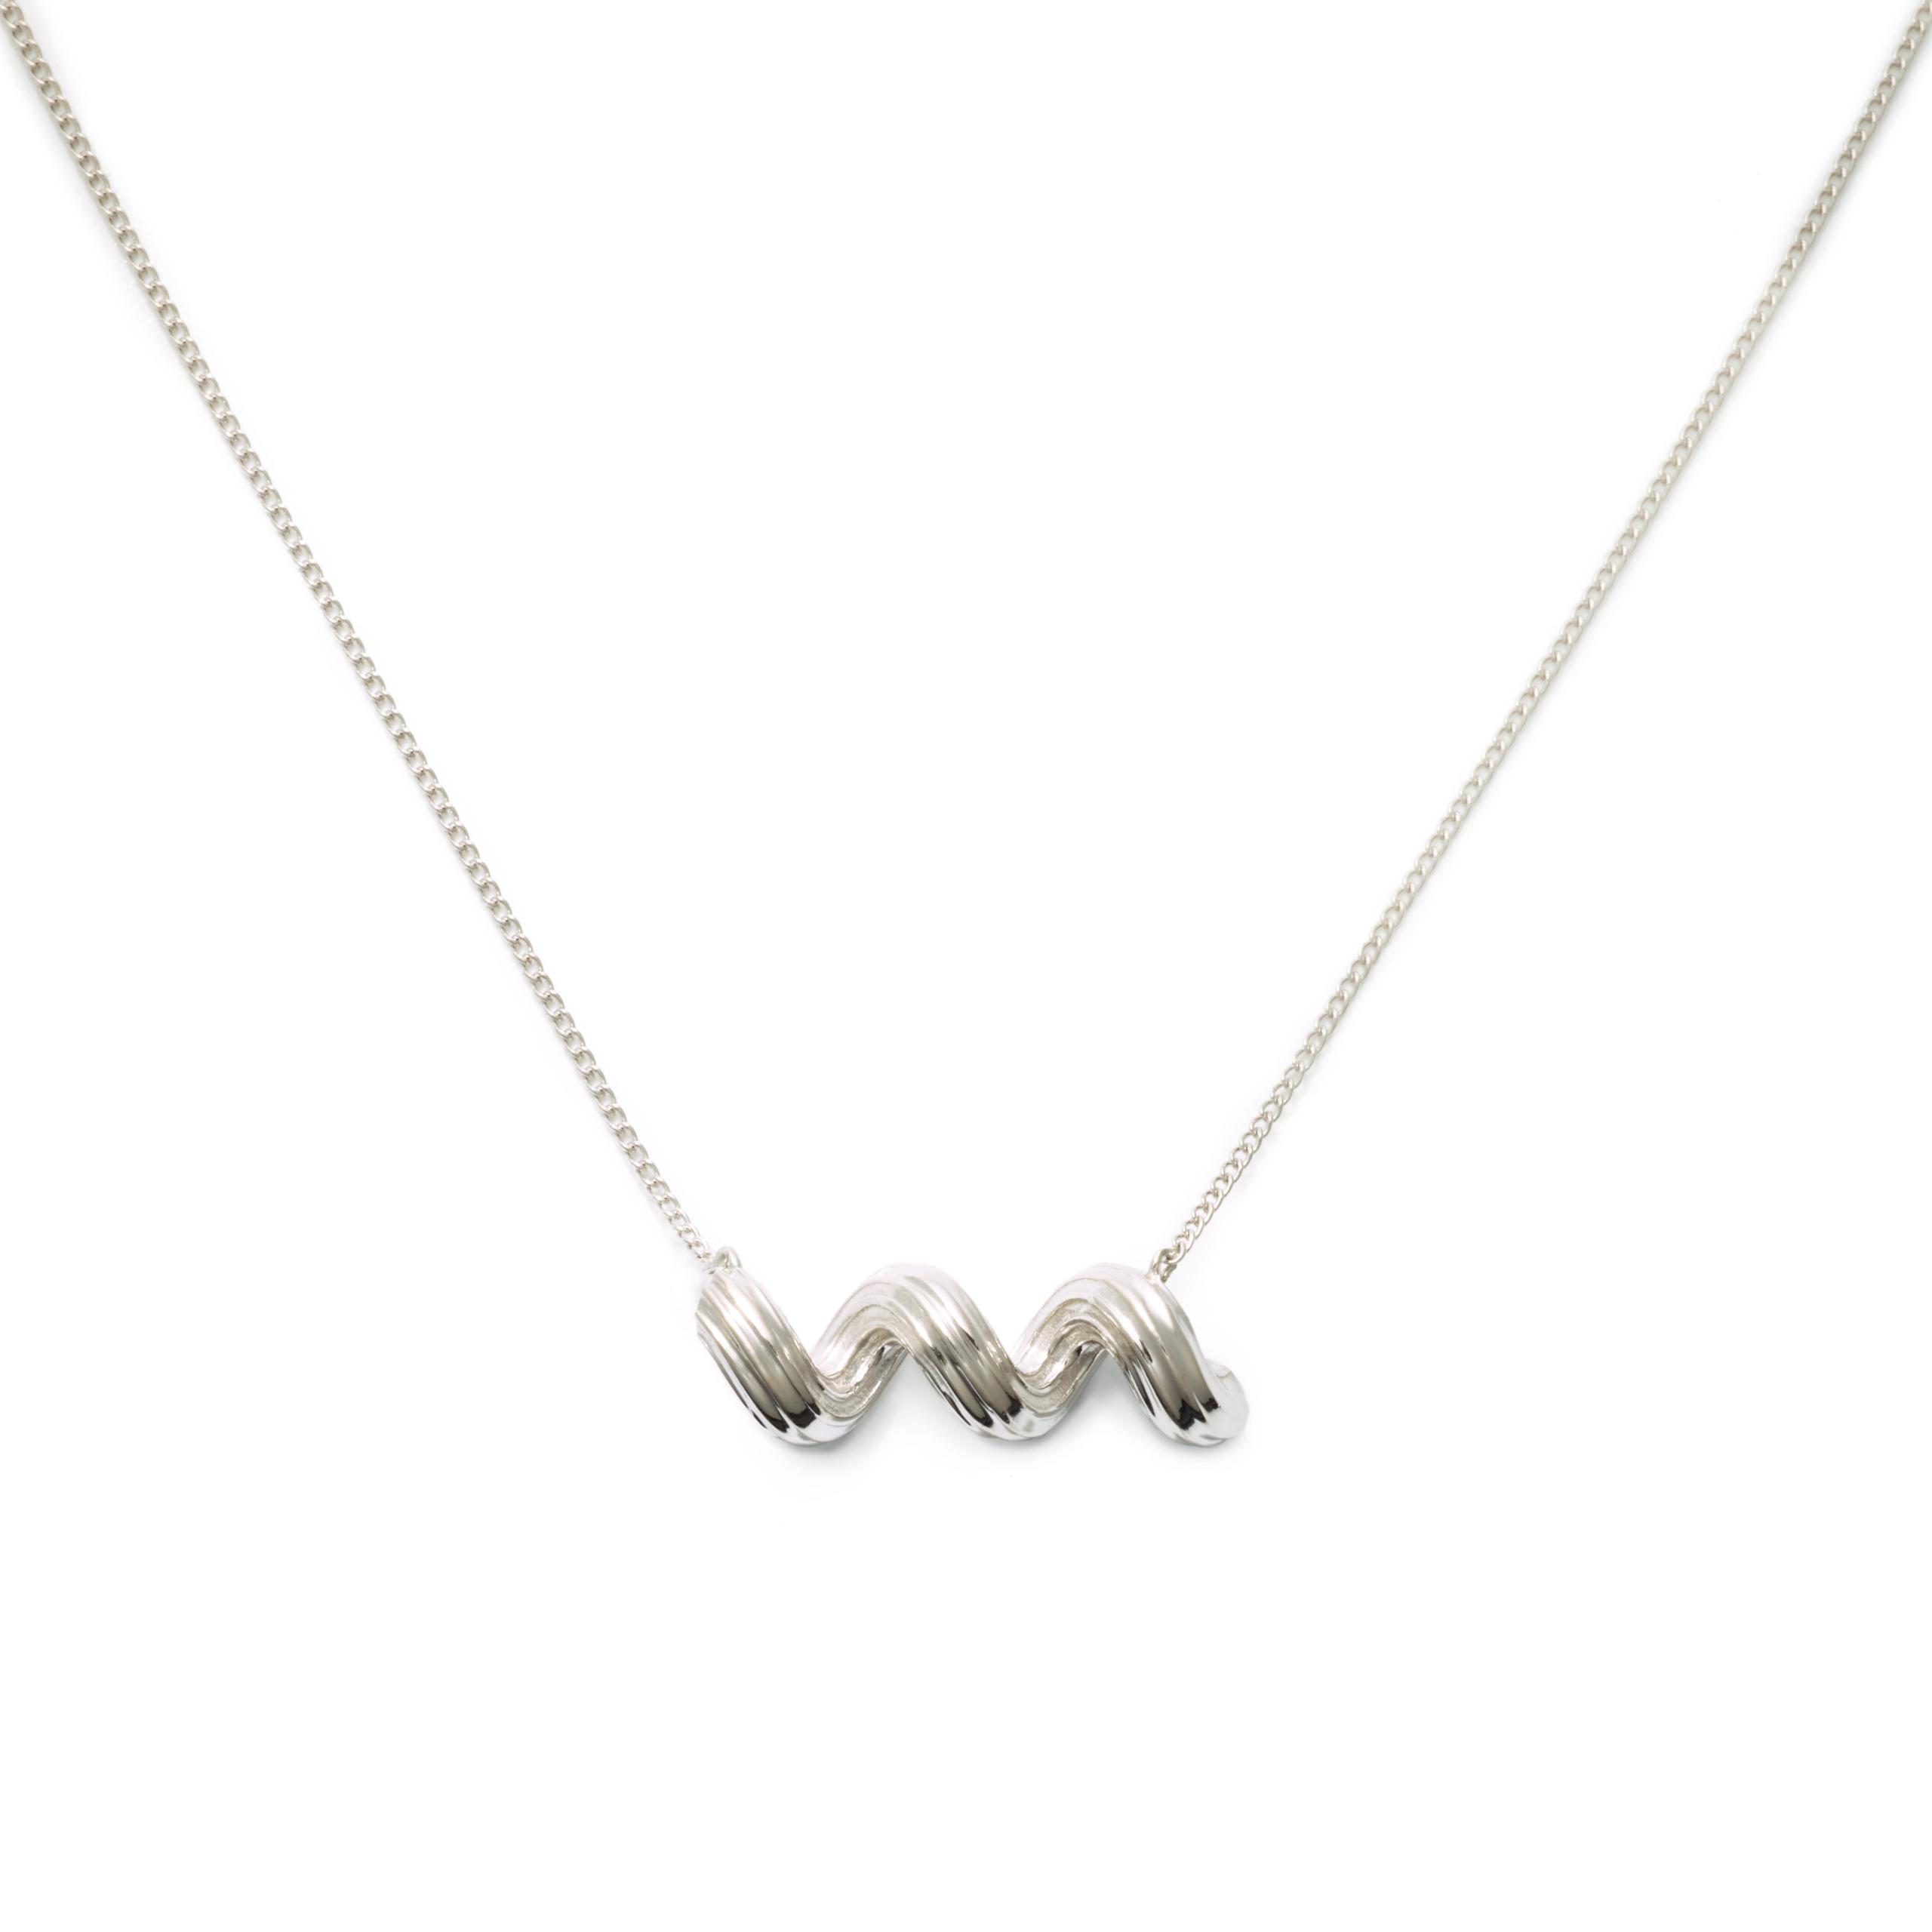 Sterling Silver Cellentani Necklace